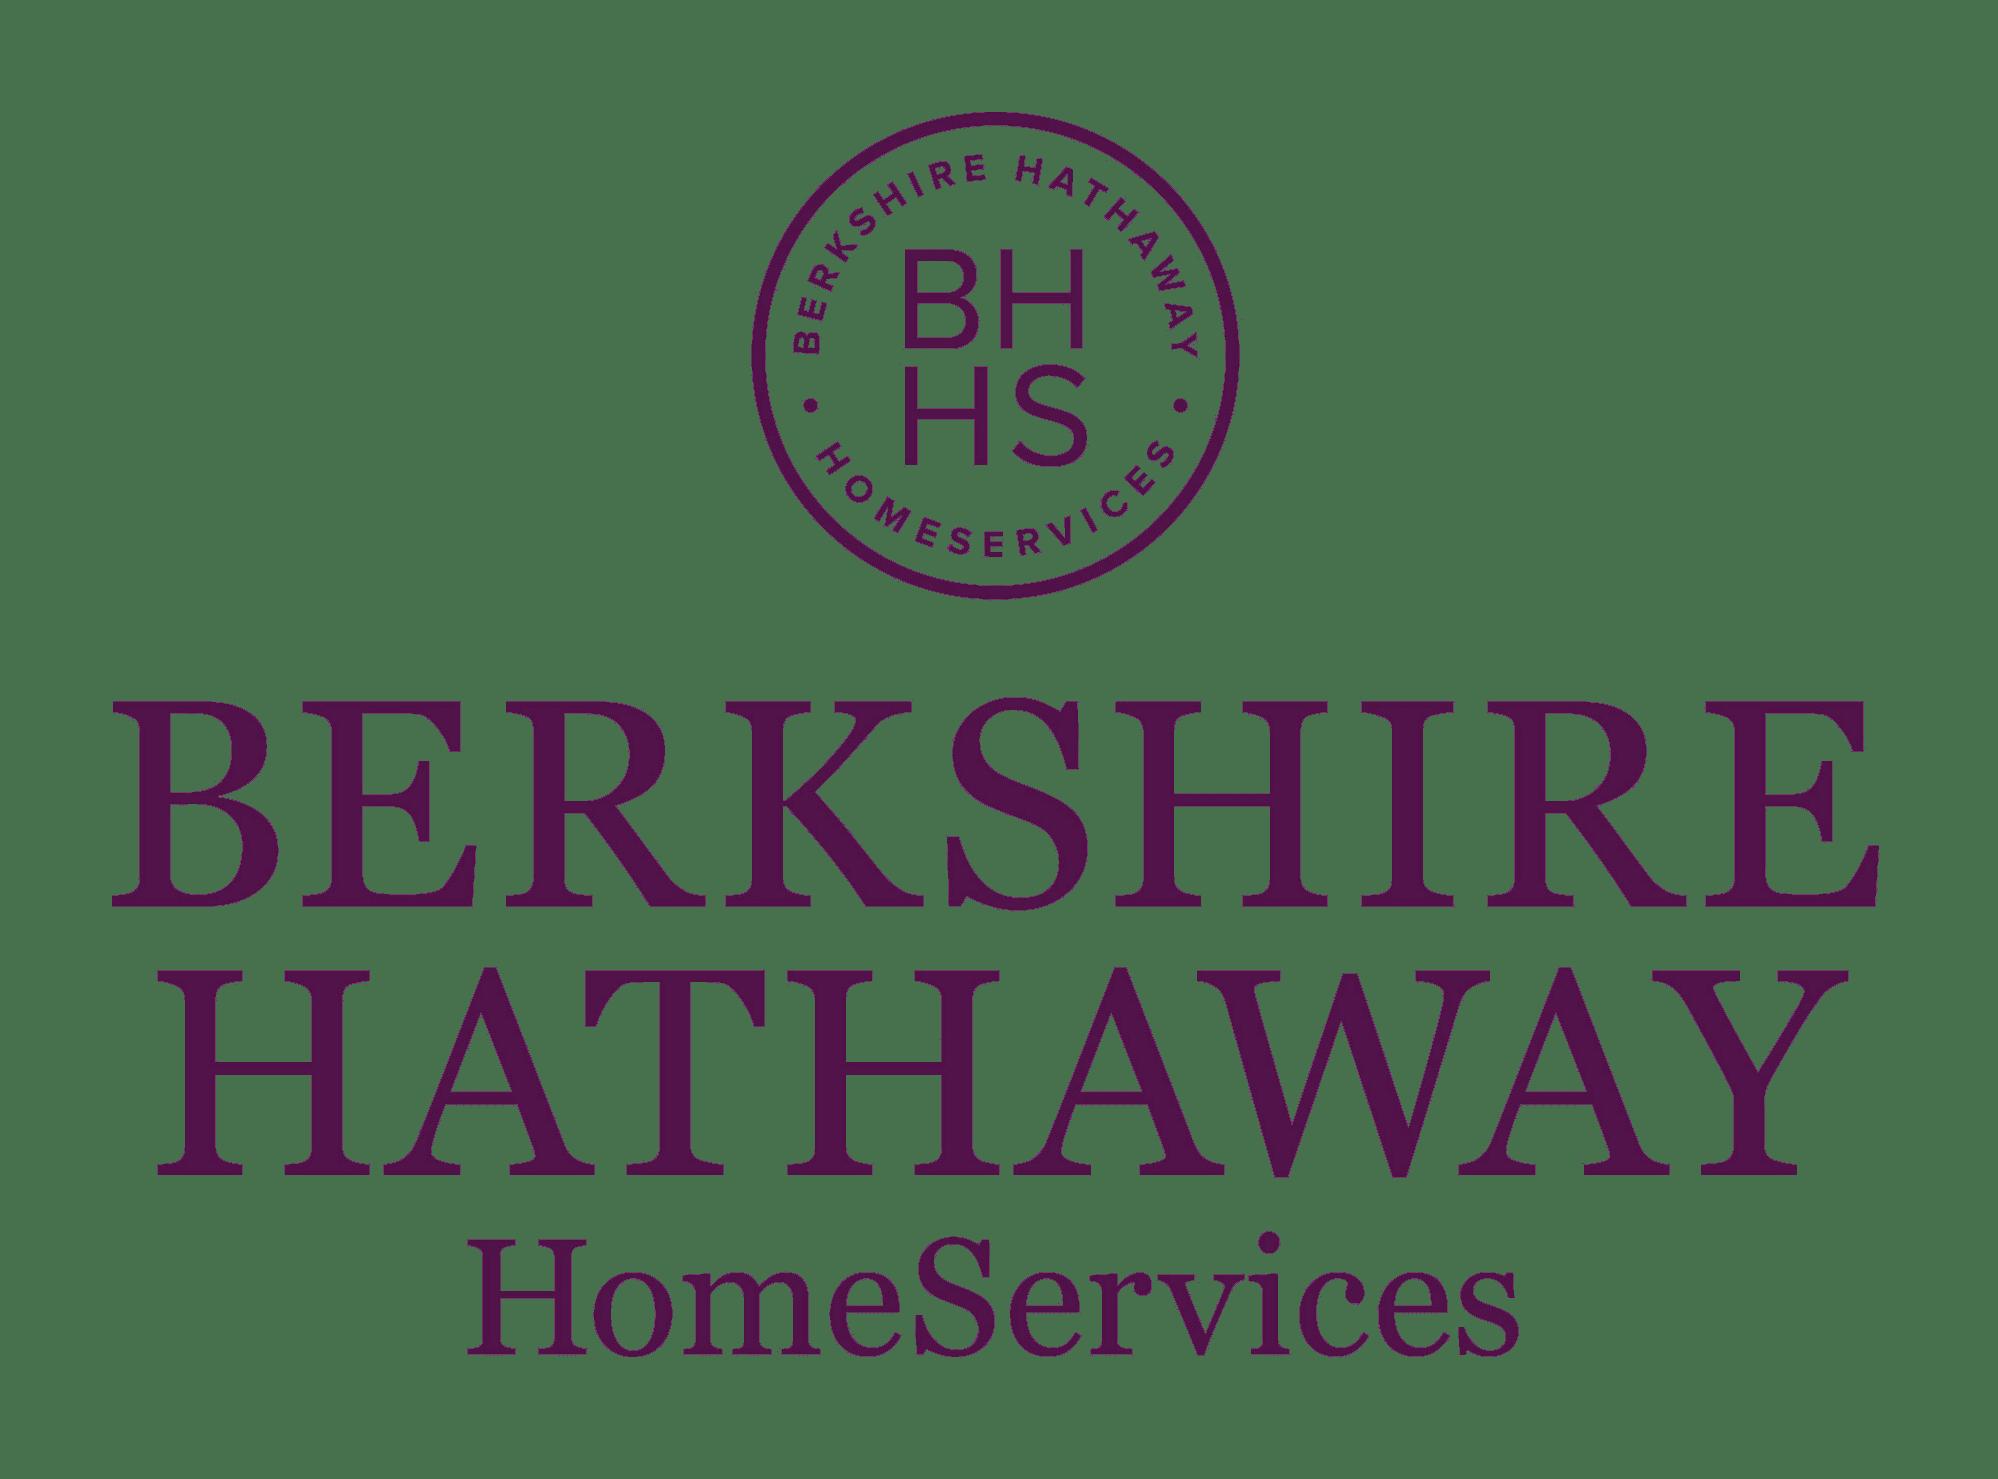 https://fkspca.org/wp-content/uploads/2019/05/PNGPIX-COM-Berkshire-Hathaway-Logo-PNG-Transparent.png